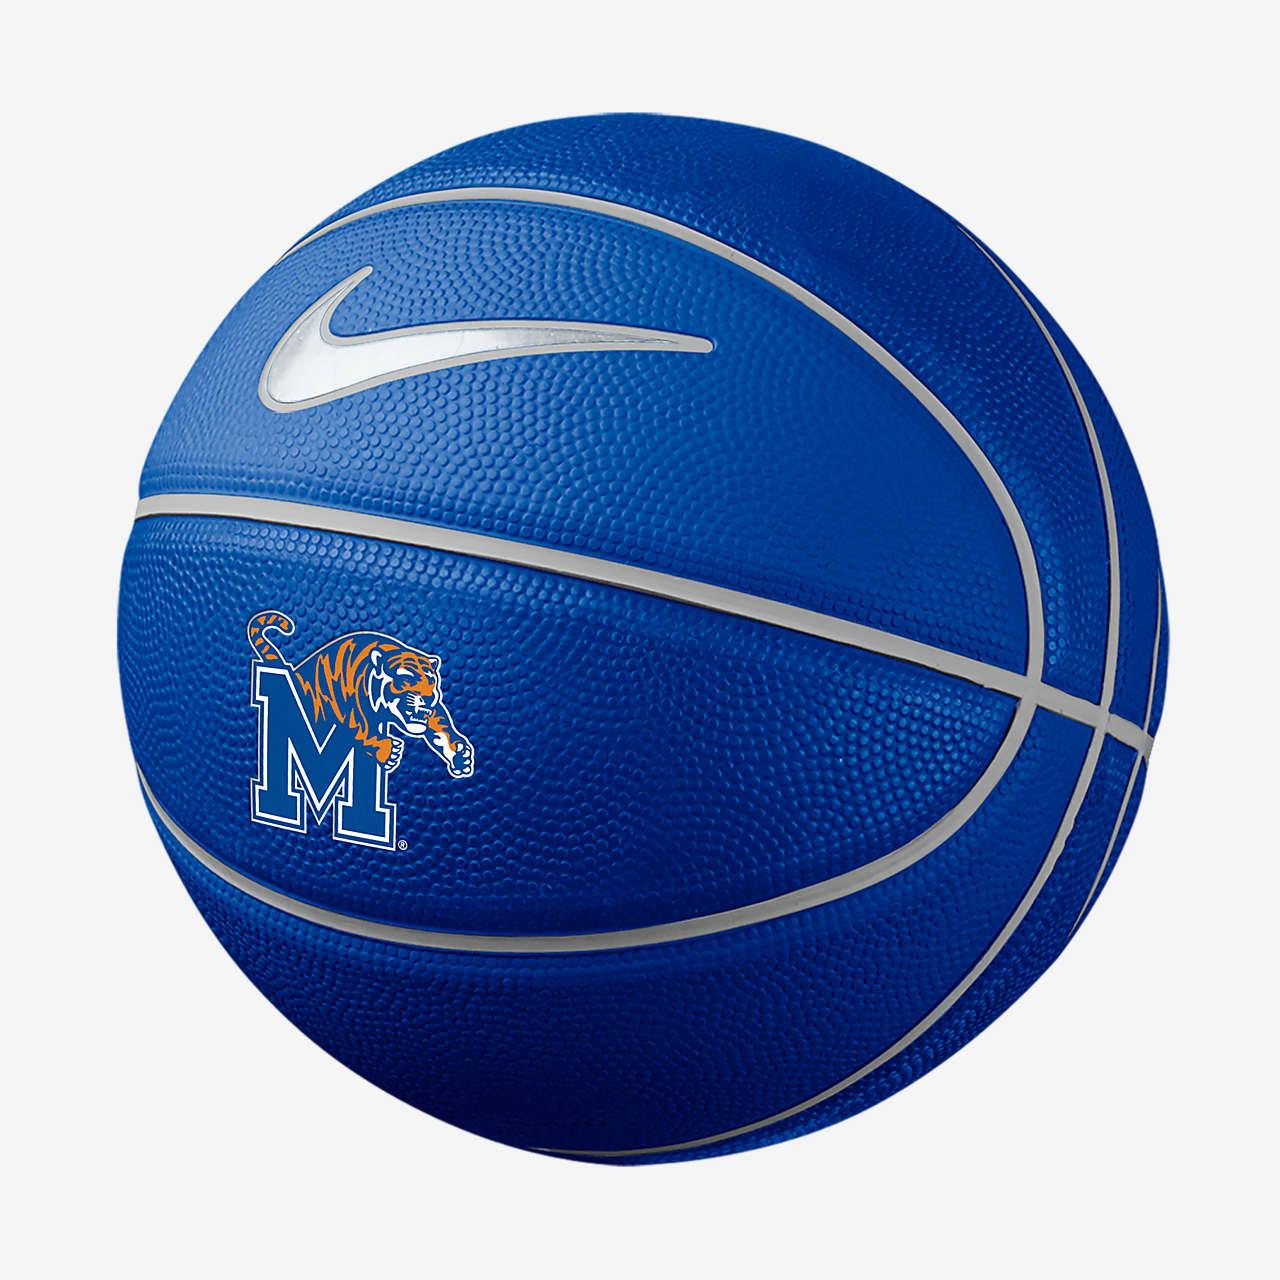 Nike College Mini (Memphis) Basketball